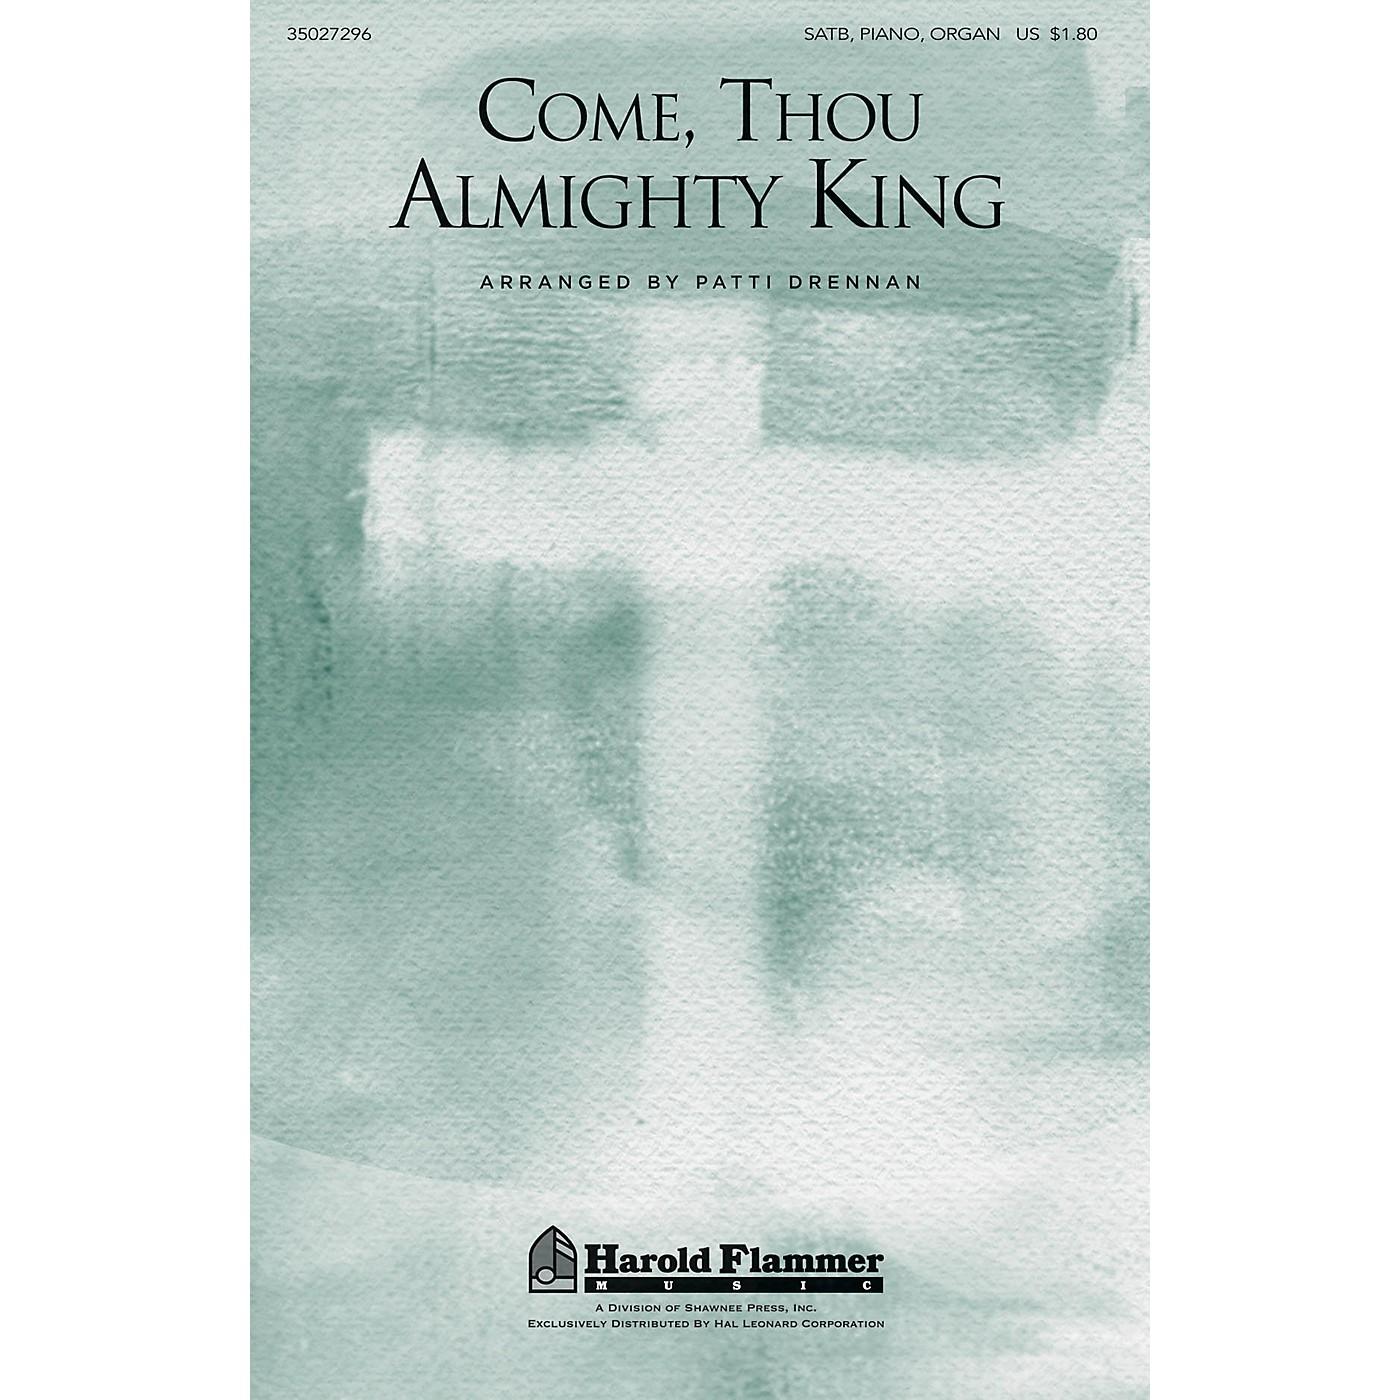 Shawnee Press Come, Thou Almighty King SATB, PIANO AND ORGAN arranged by Patti Drennan thumbnail